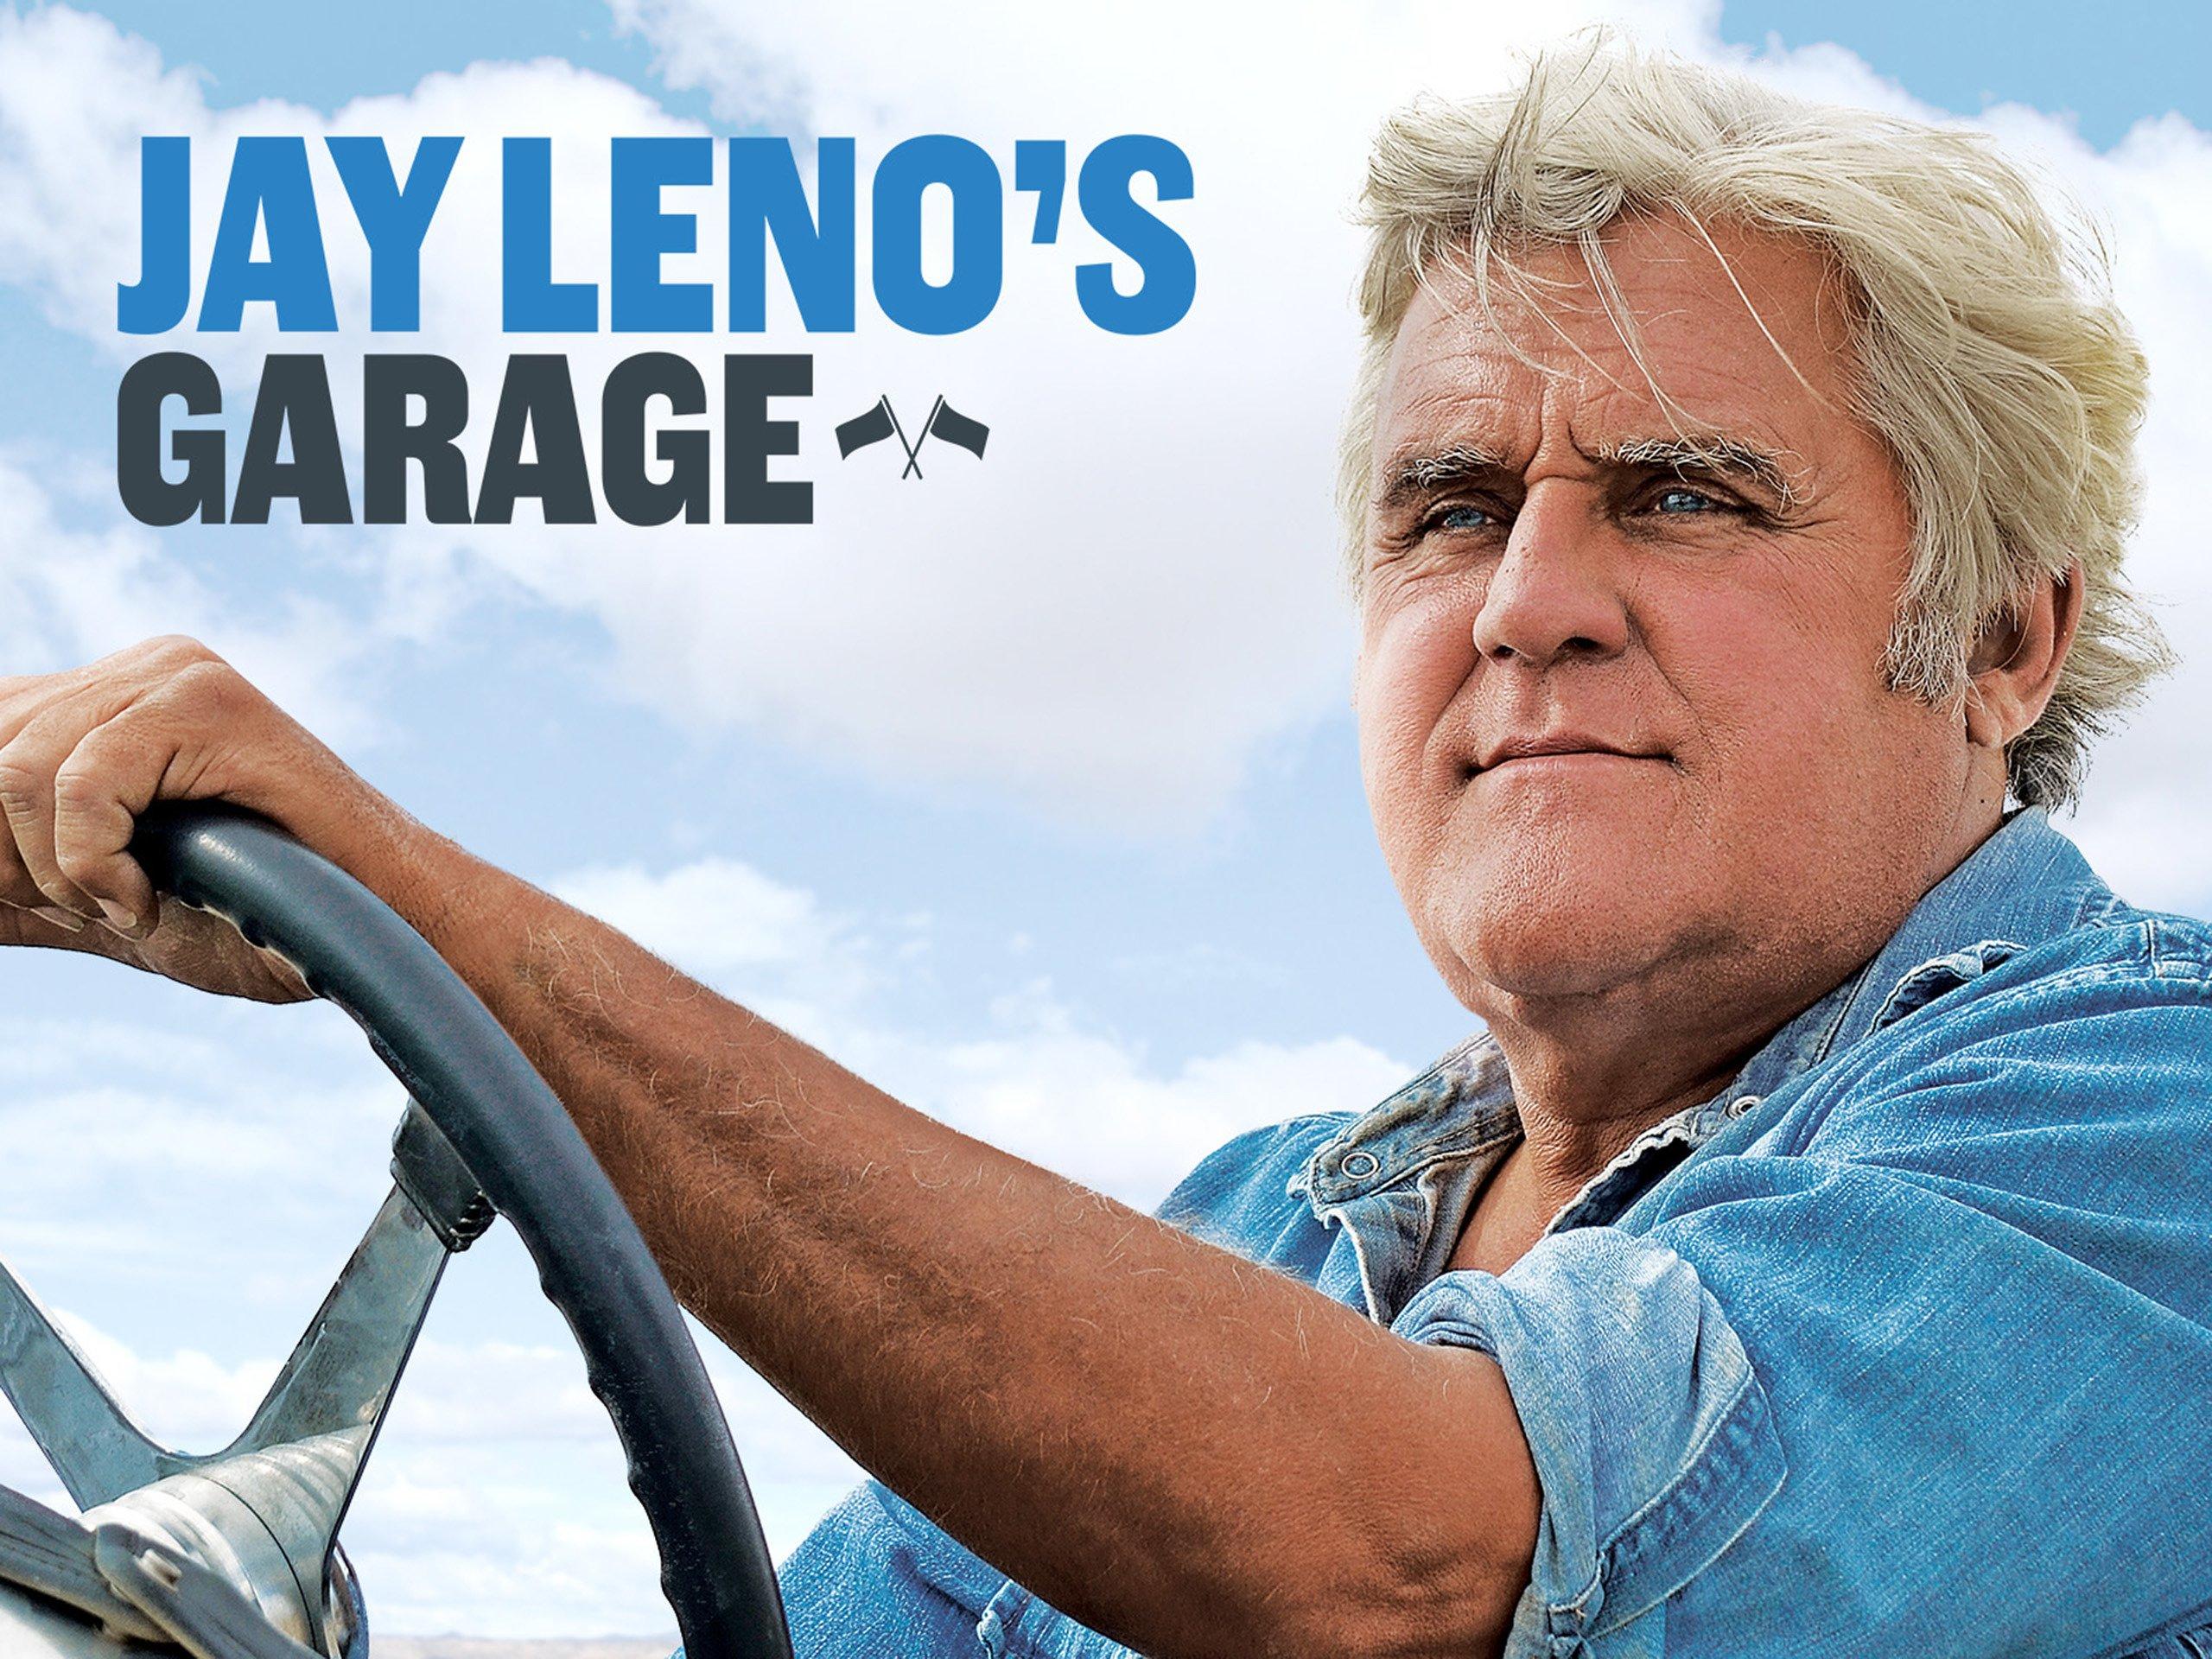 Jay Leno's Garage - Season 2